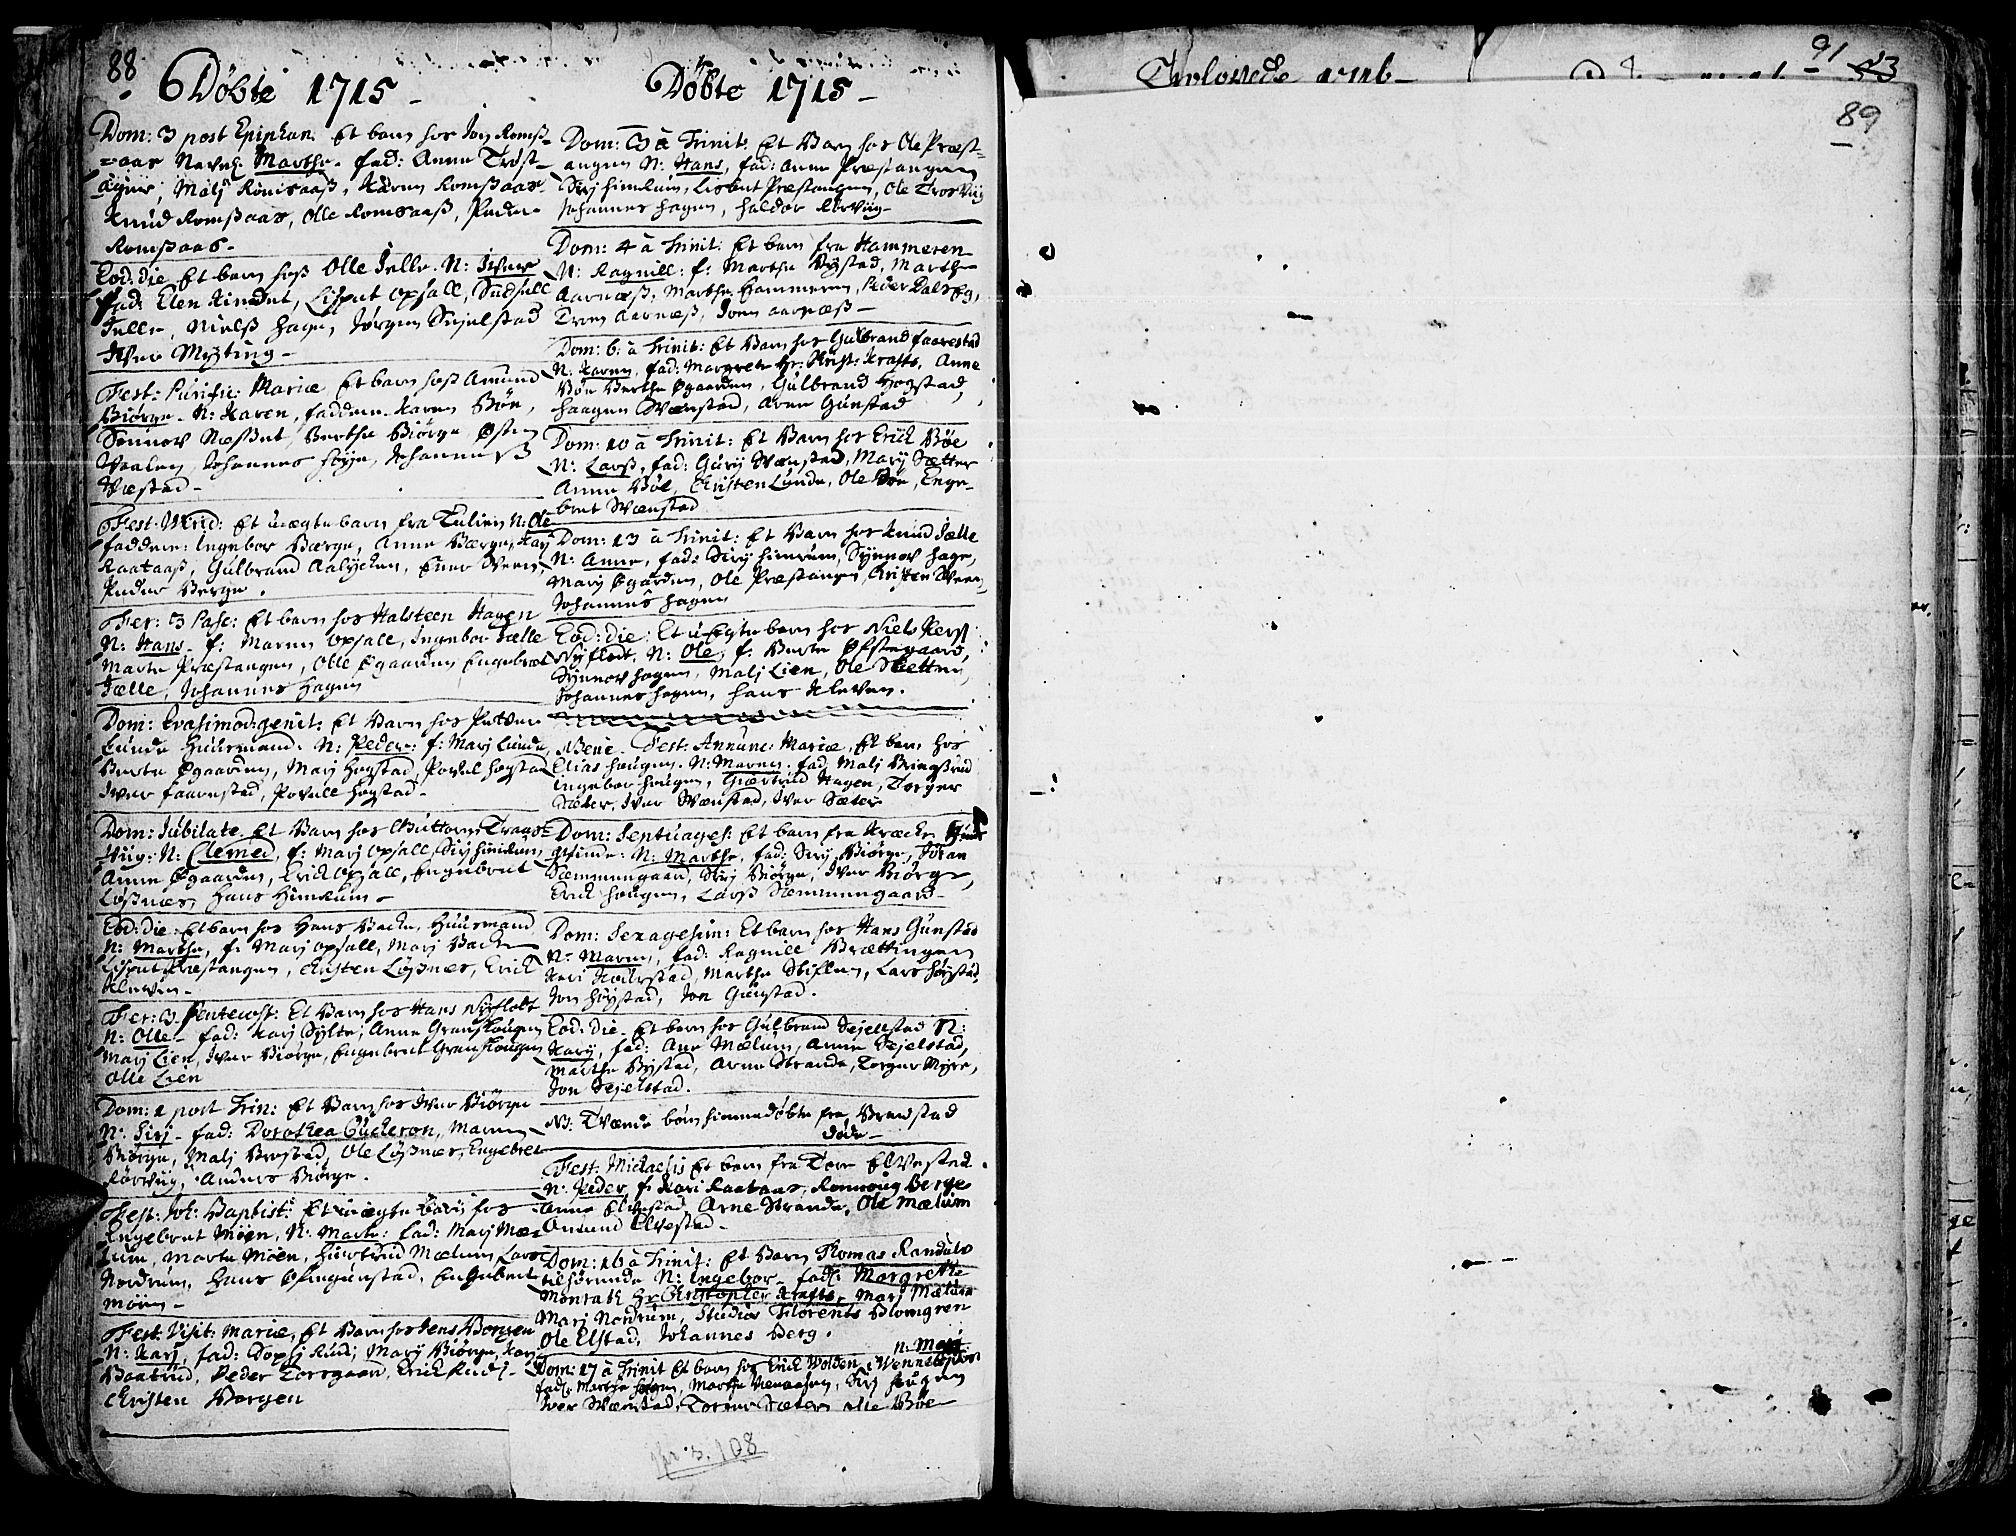 SAH, Ringebu prestekontor, Ministerialbok nr. 1, 1696-1733, s. 88-89